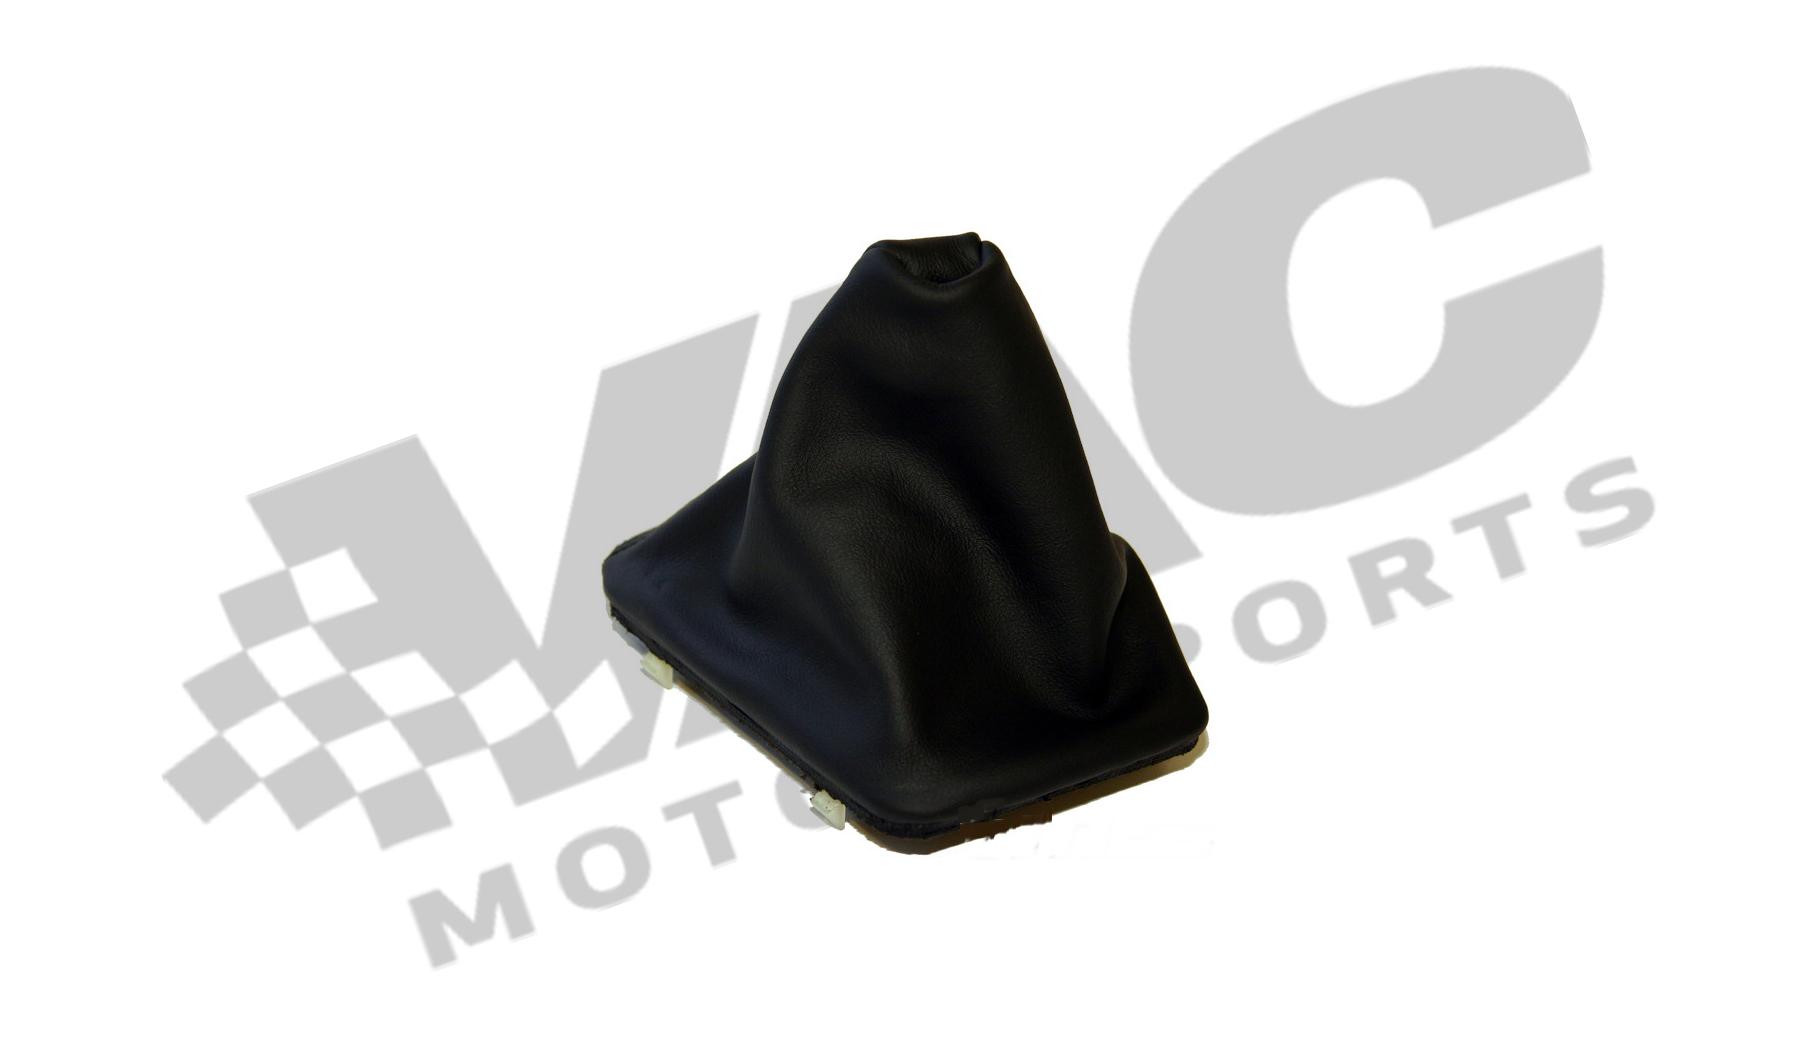 BMW 25-11-1-221-665 Auto part